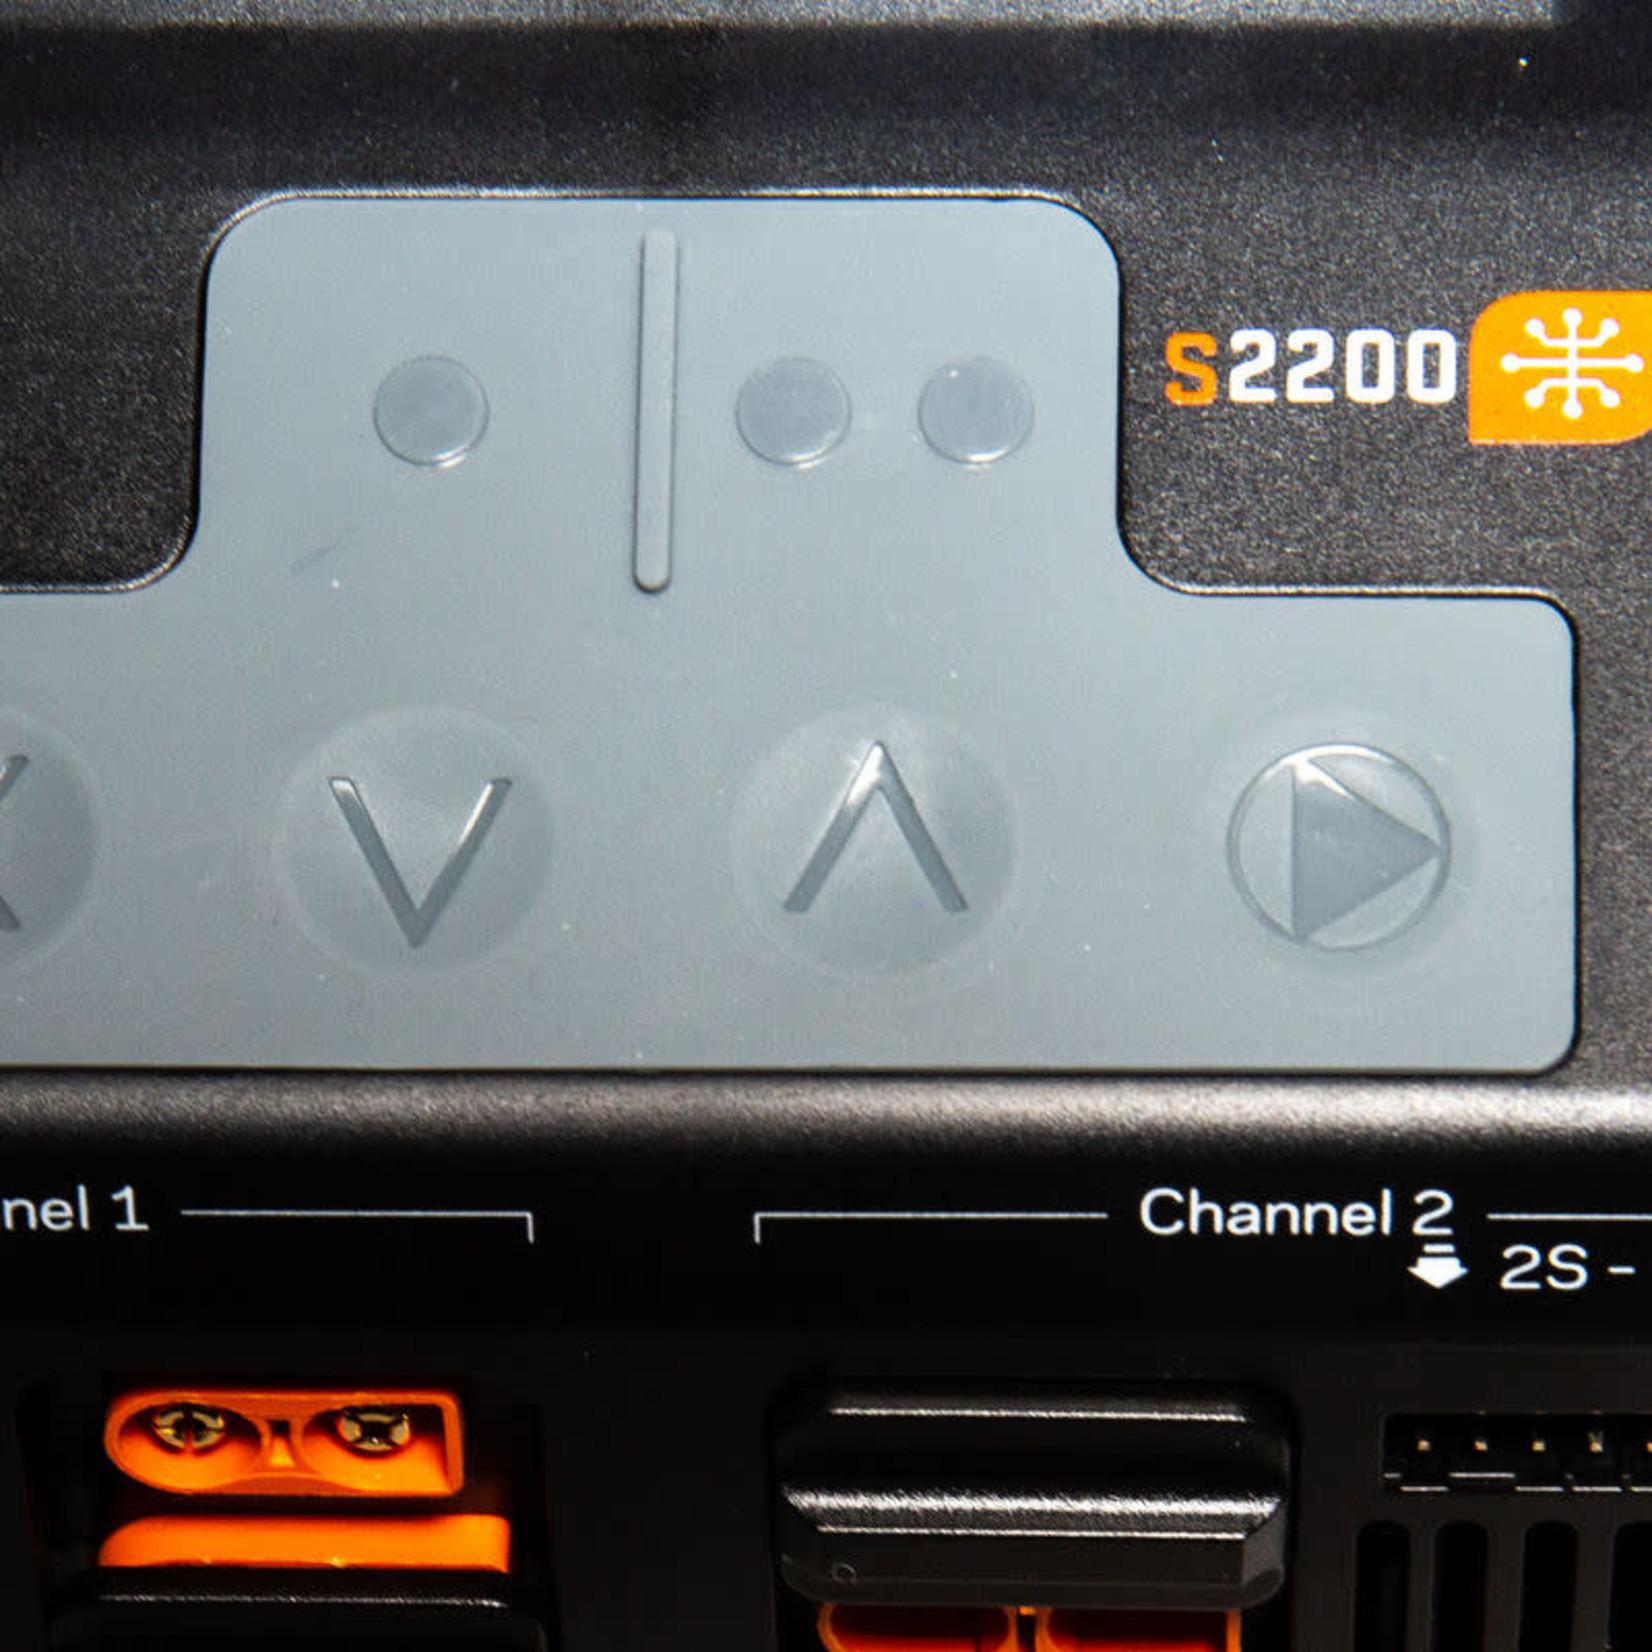 Spektrum SPMXC2010 Spektrum S2200 G2 AC 2x200W Smart Charger